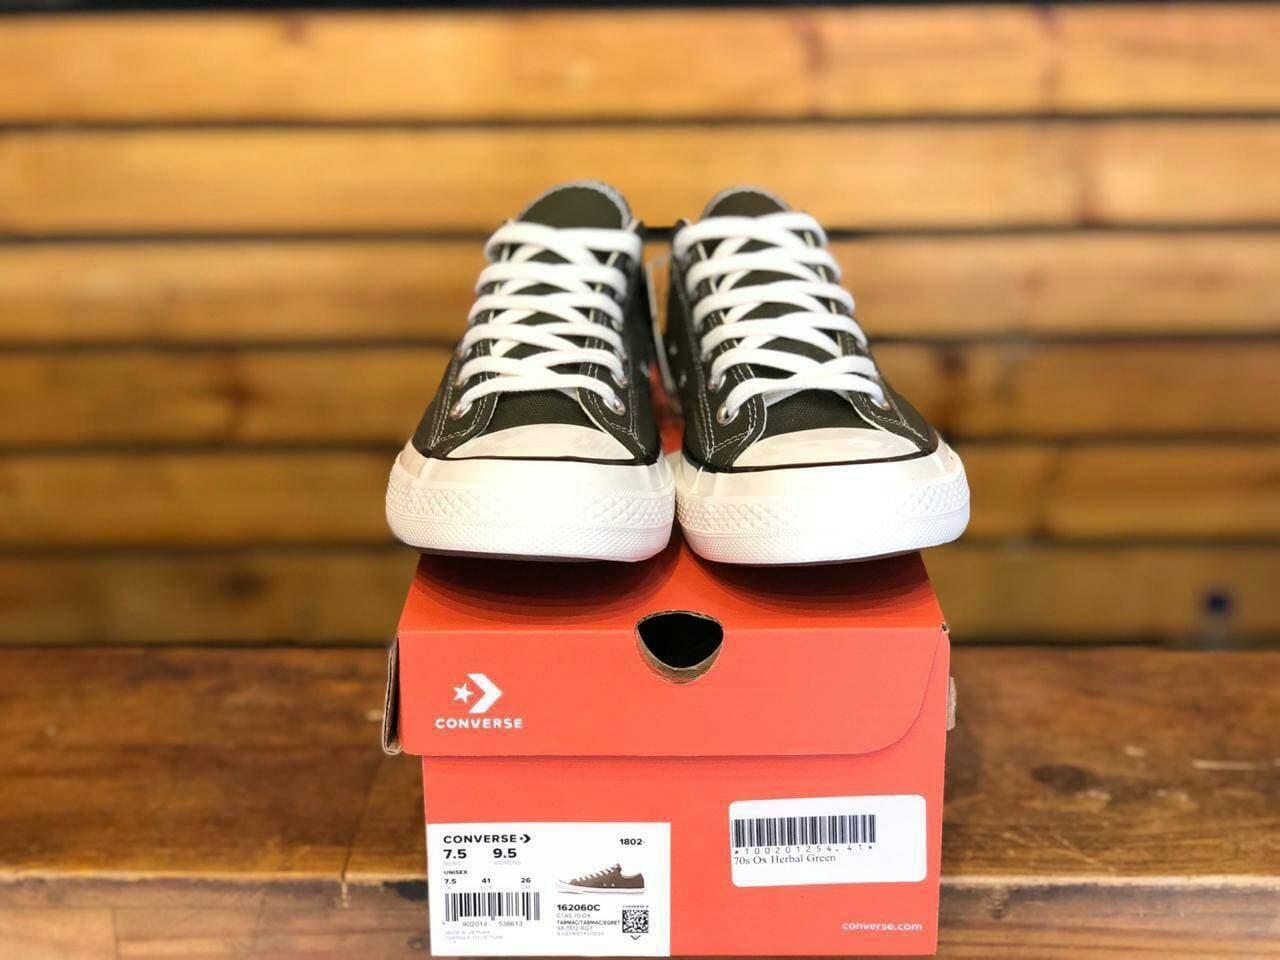 c7d9dcb62ecd Jual Flash Sale Sepatu Sneakers Pria Converse 70s Ox Hrebal Green ...